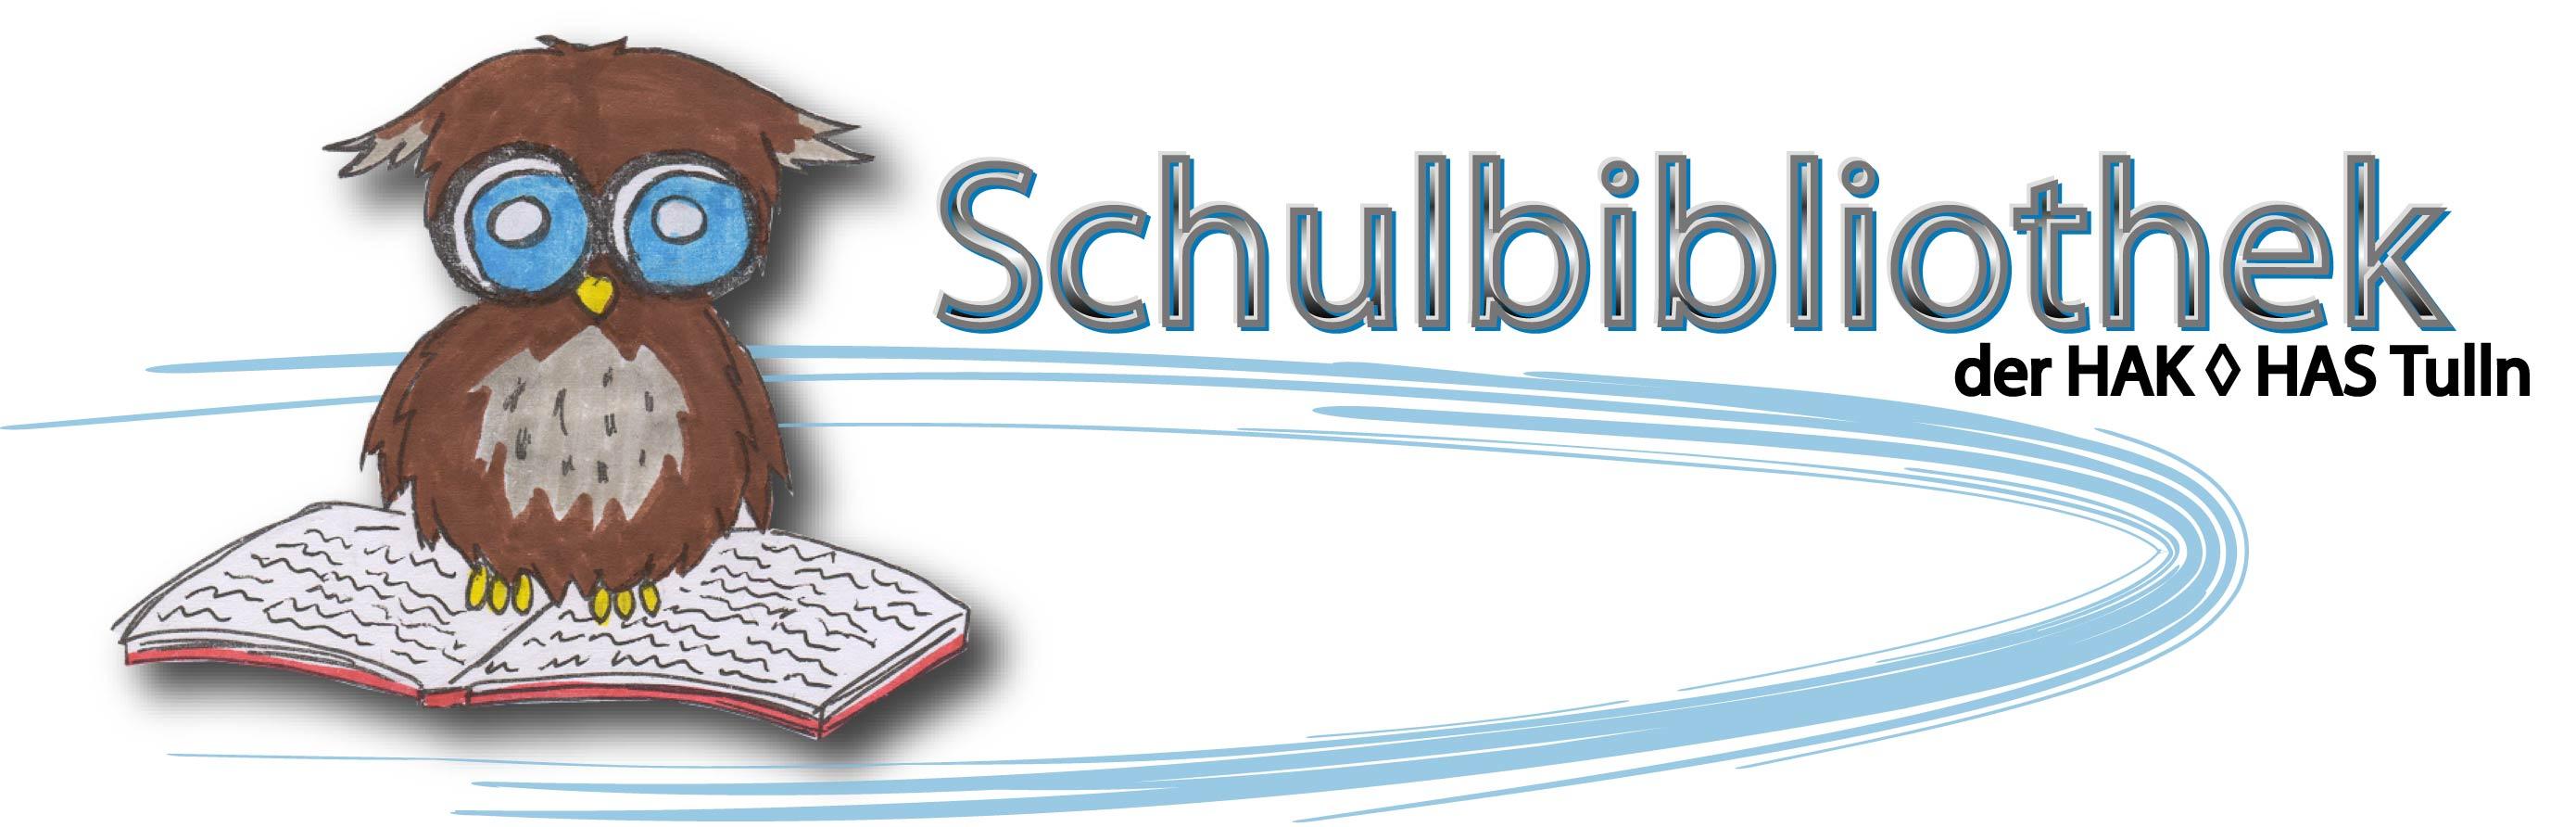 Schulbibliothek HAK/HAS Tulln